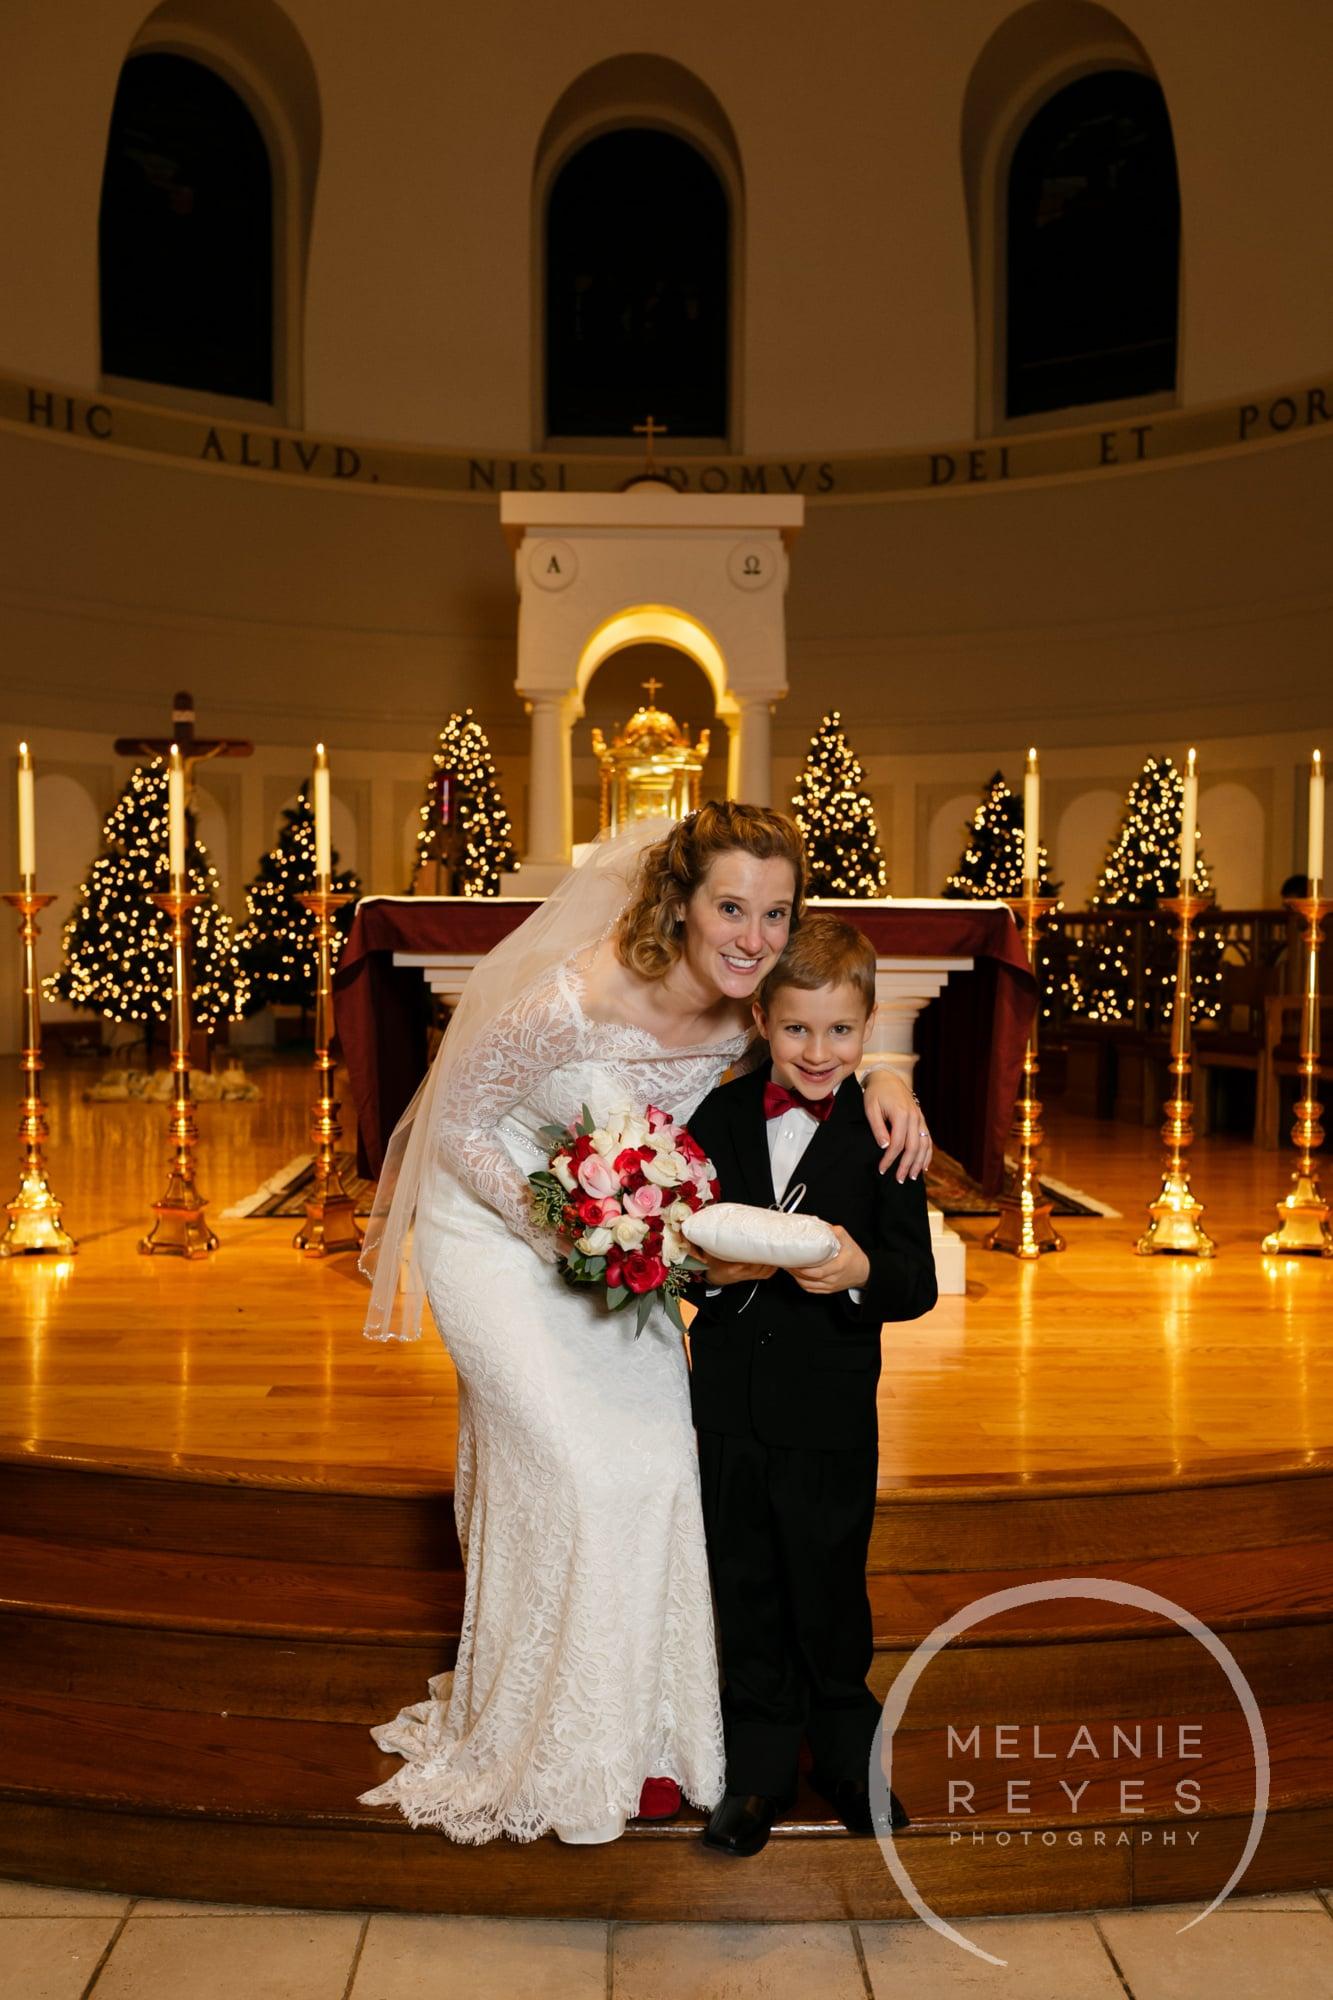 2015_ann_arbor_wedding_photographer_melaniereyes_037.JPG